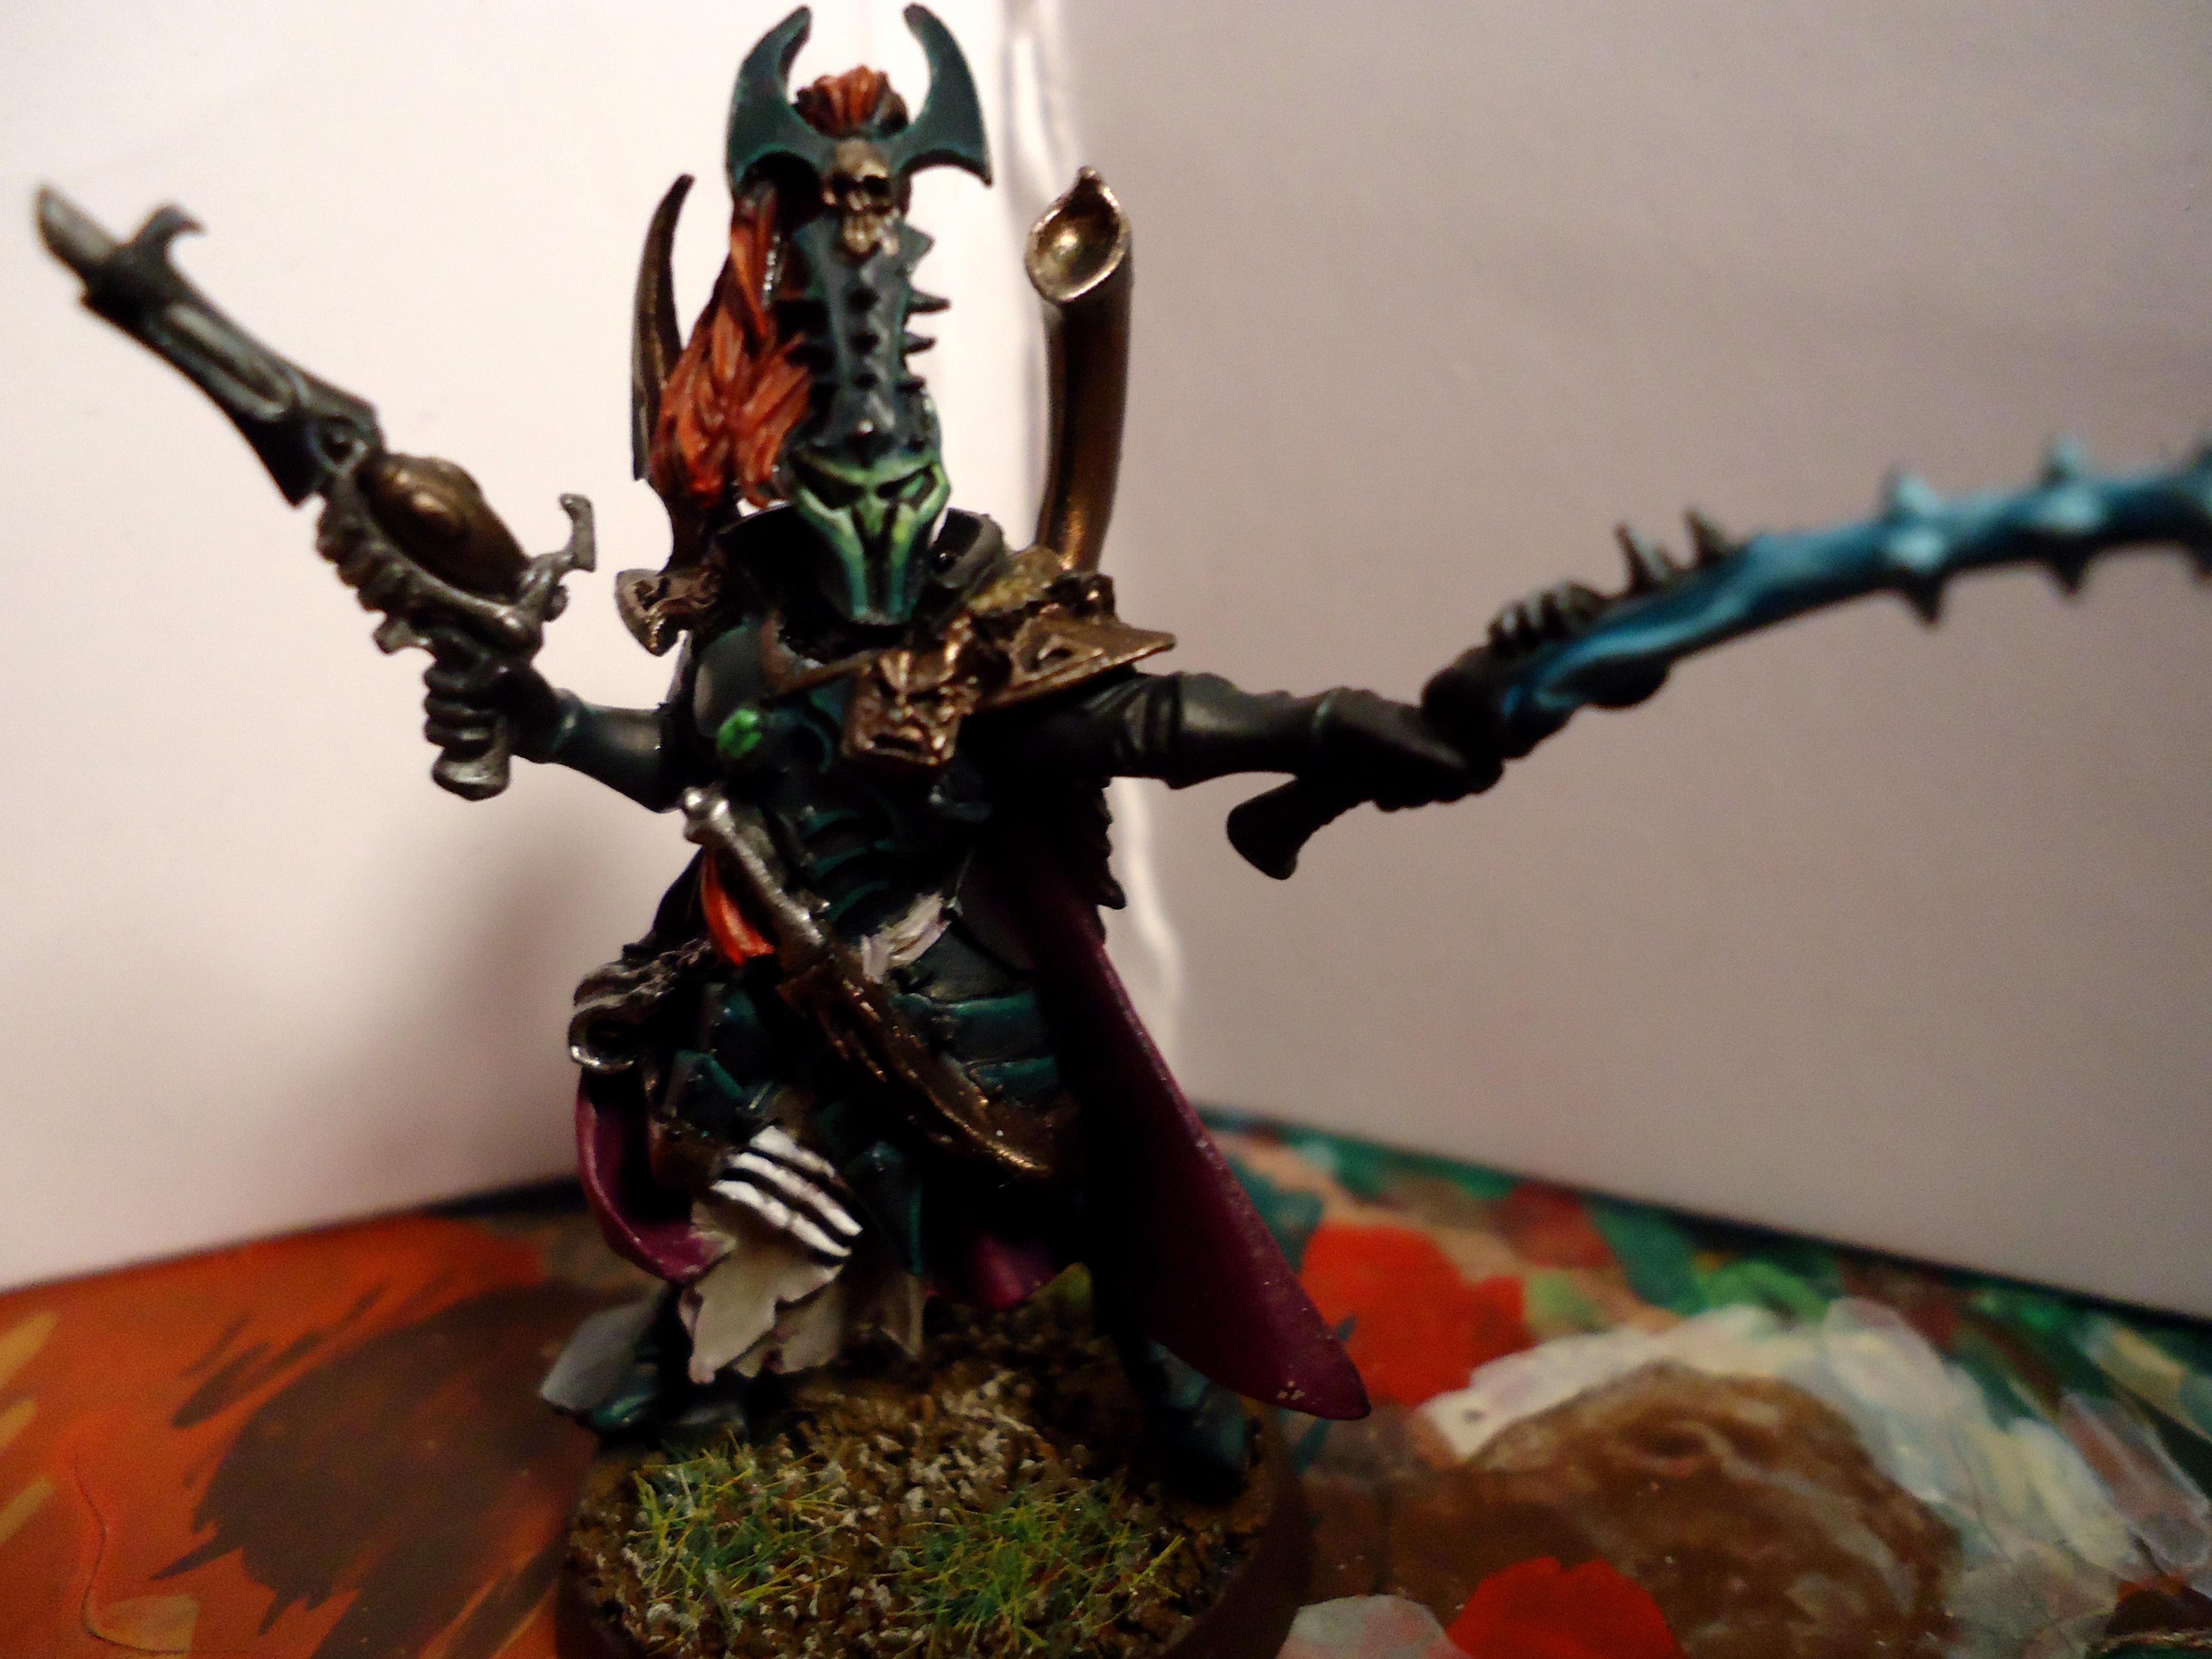 Archon, Black Heart, Blast Pistol. Green, Dark Eldar, Purple